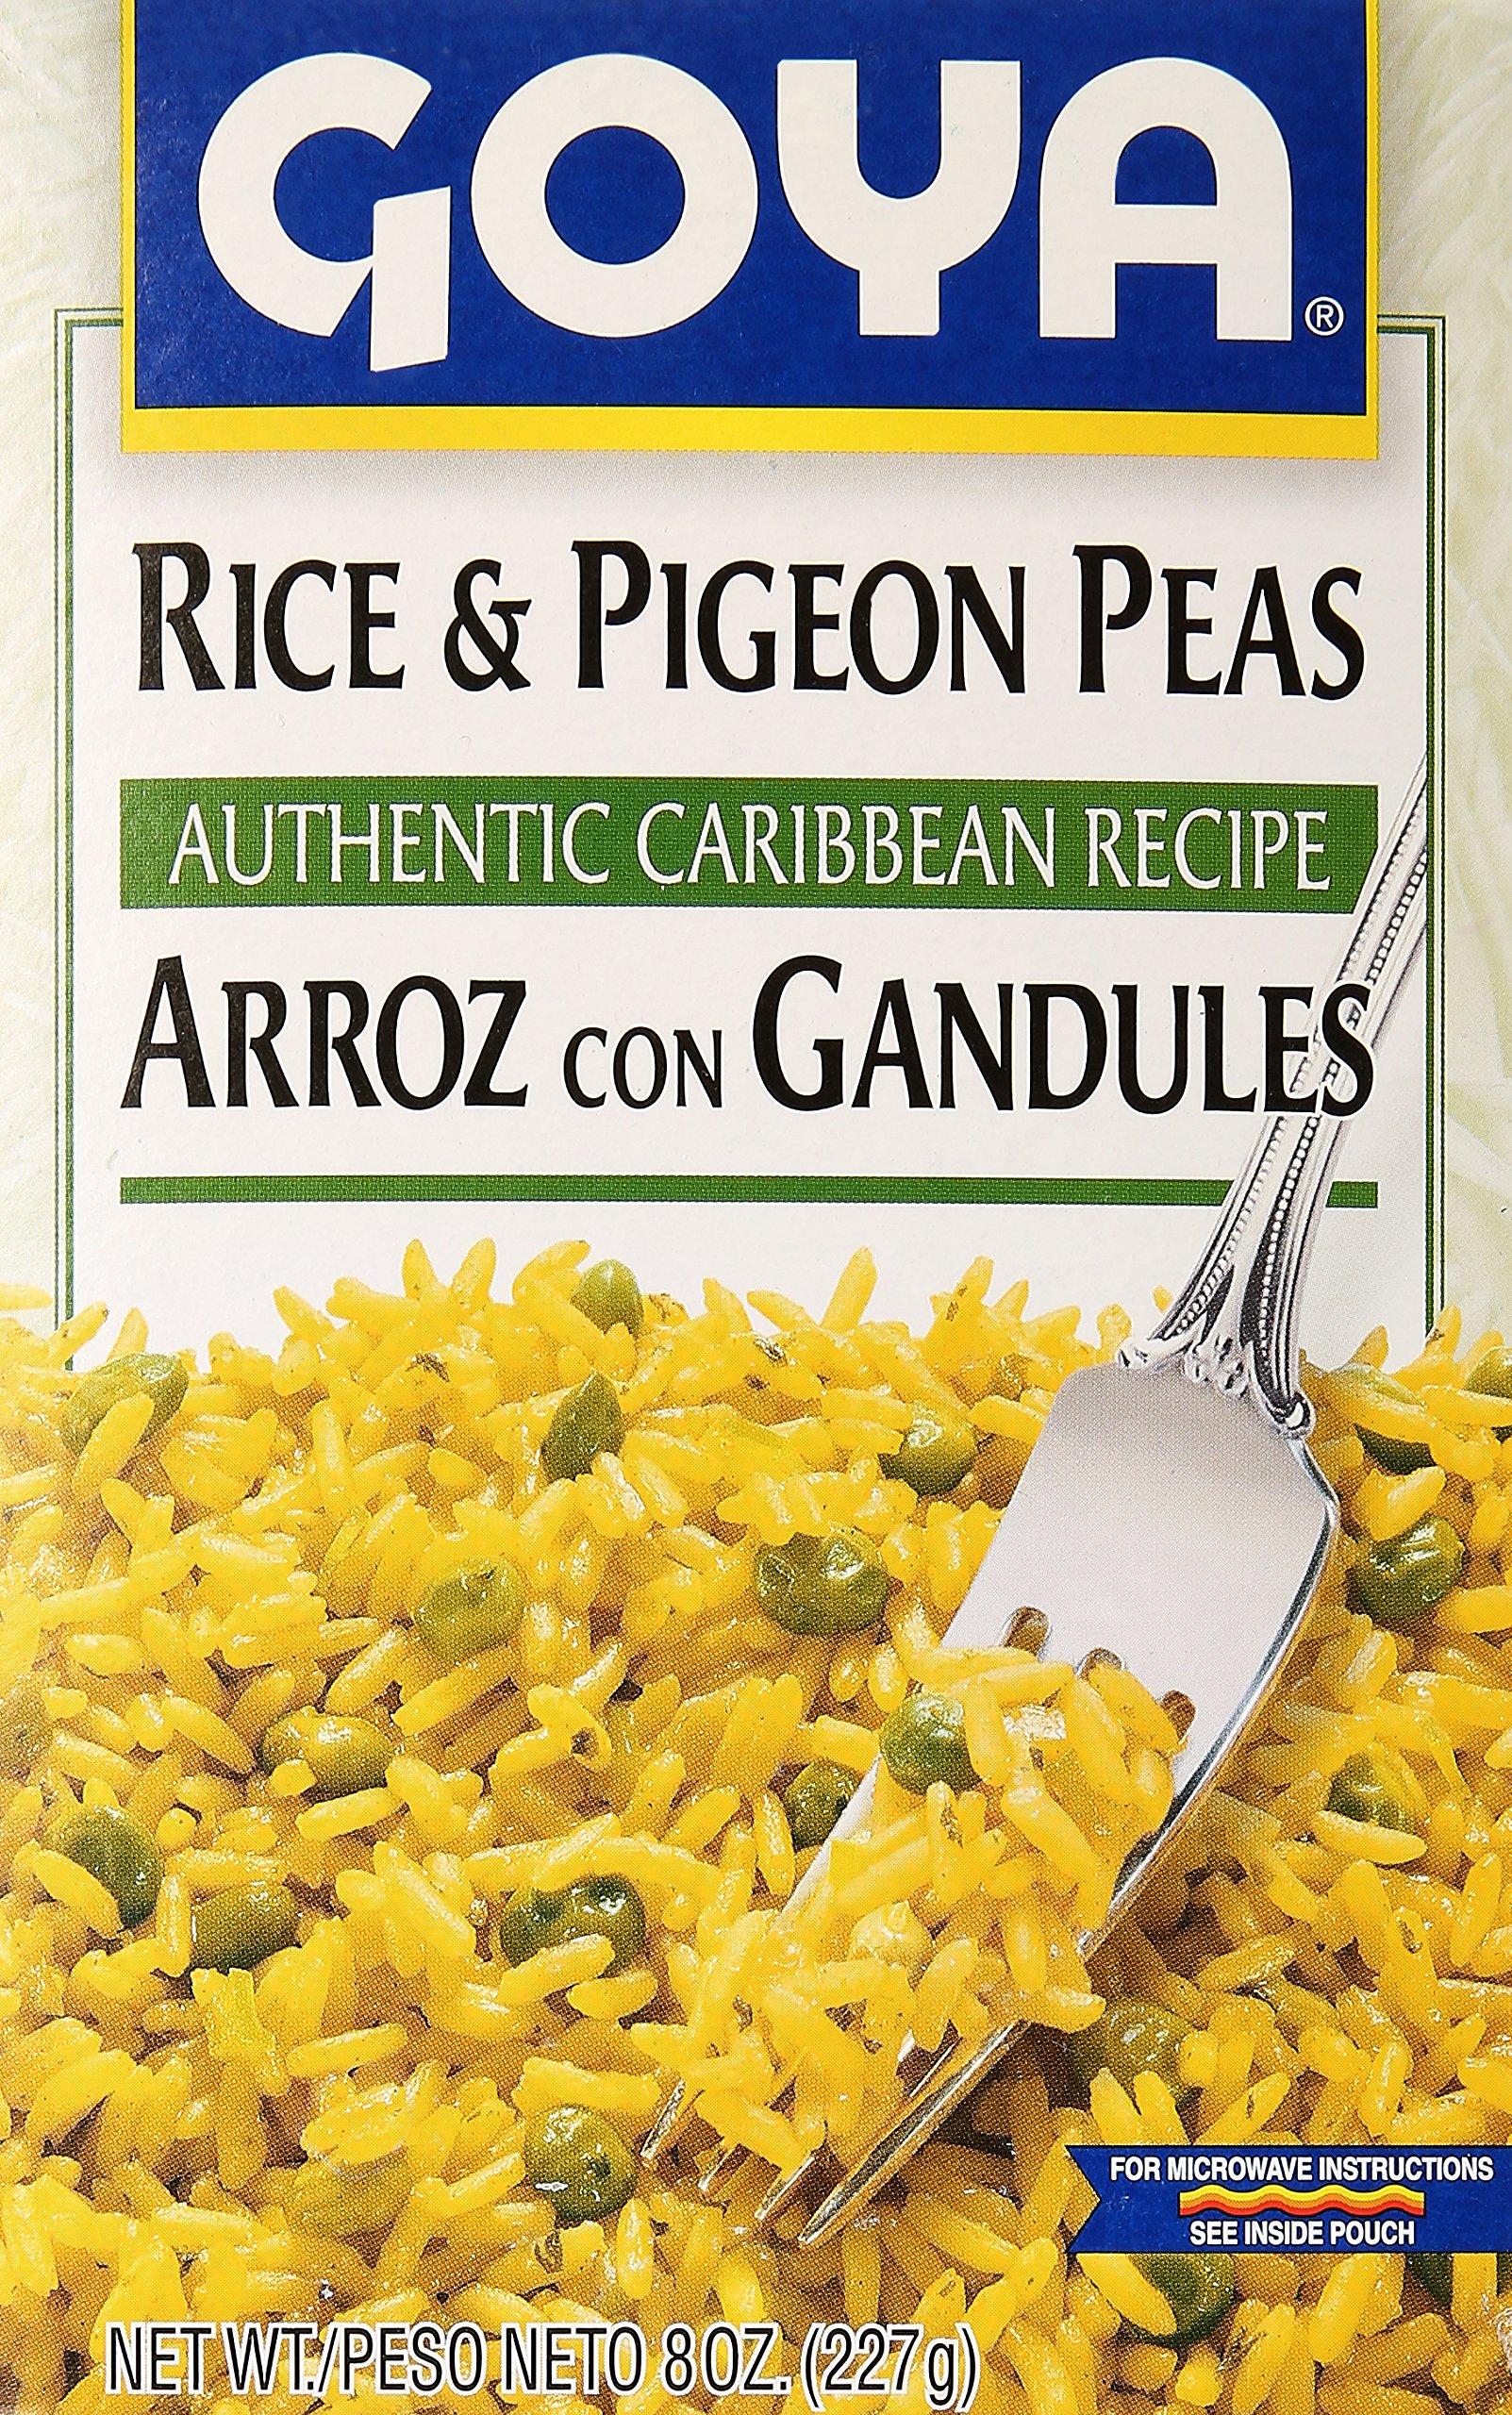 Goya Arroz con Gandules Rice & Pigeon Peas